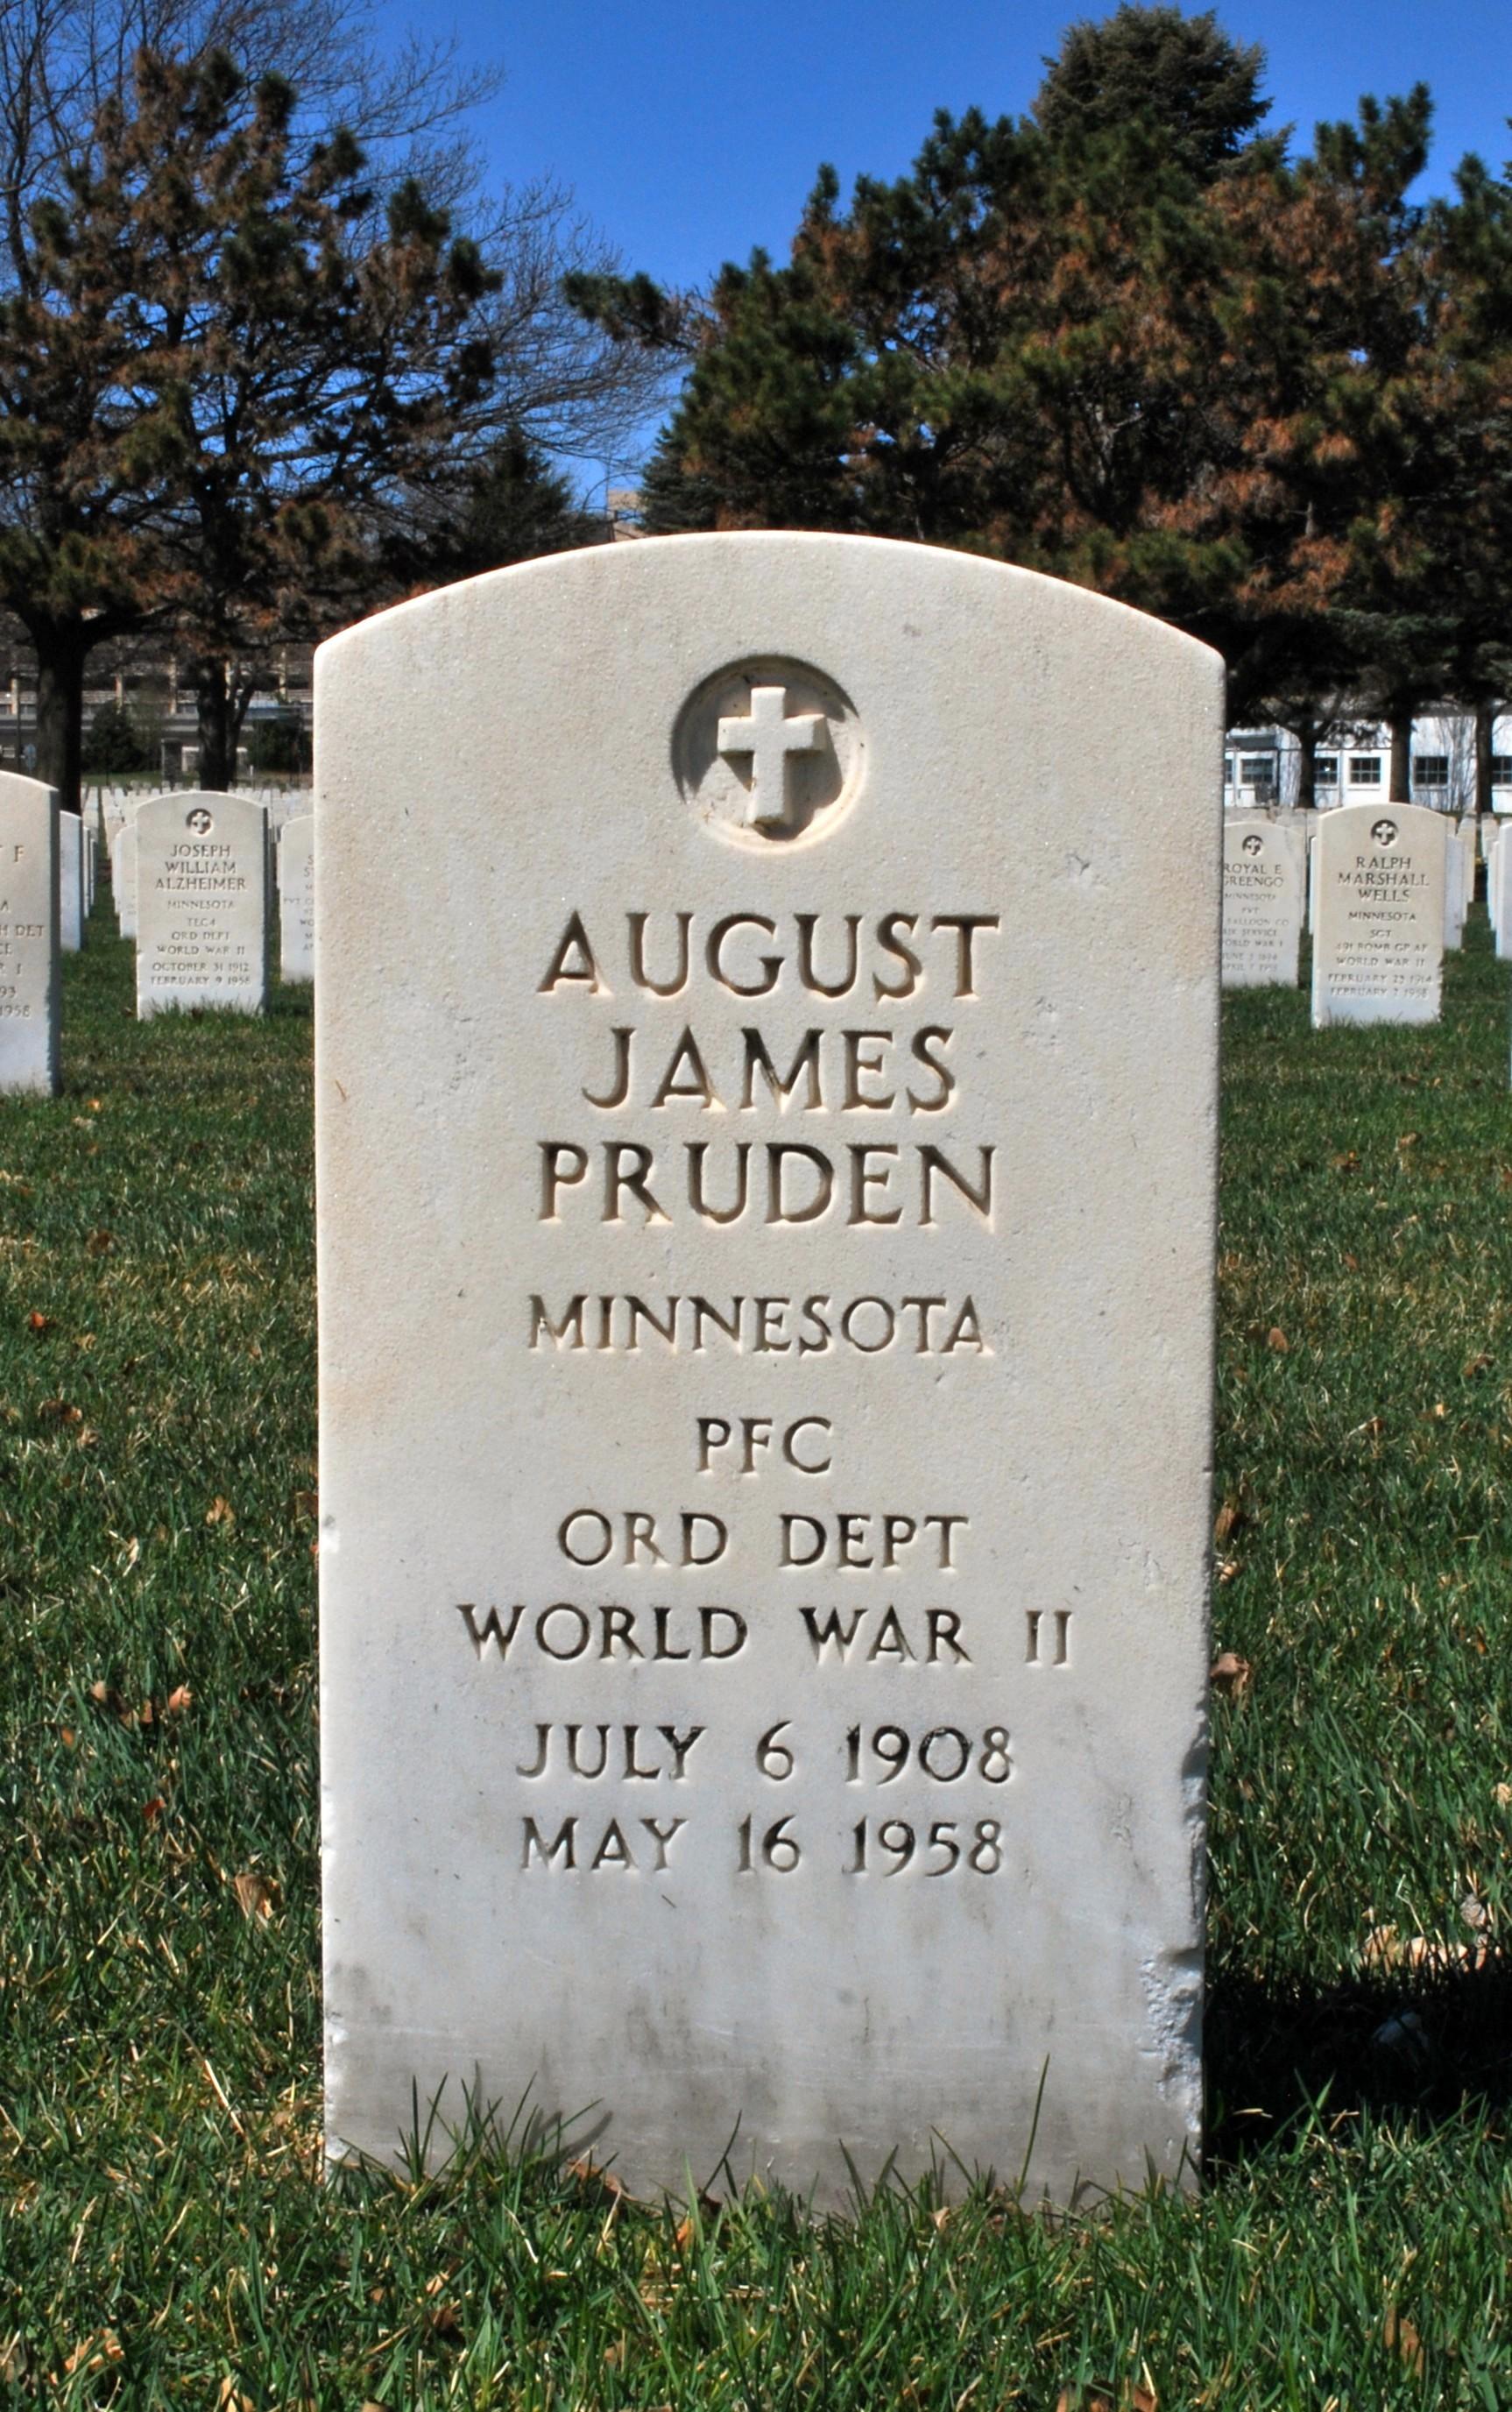 PFC August James Pruden, Jr